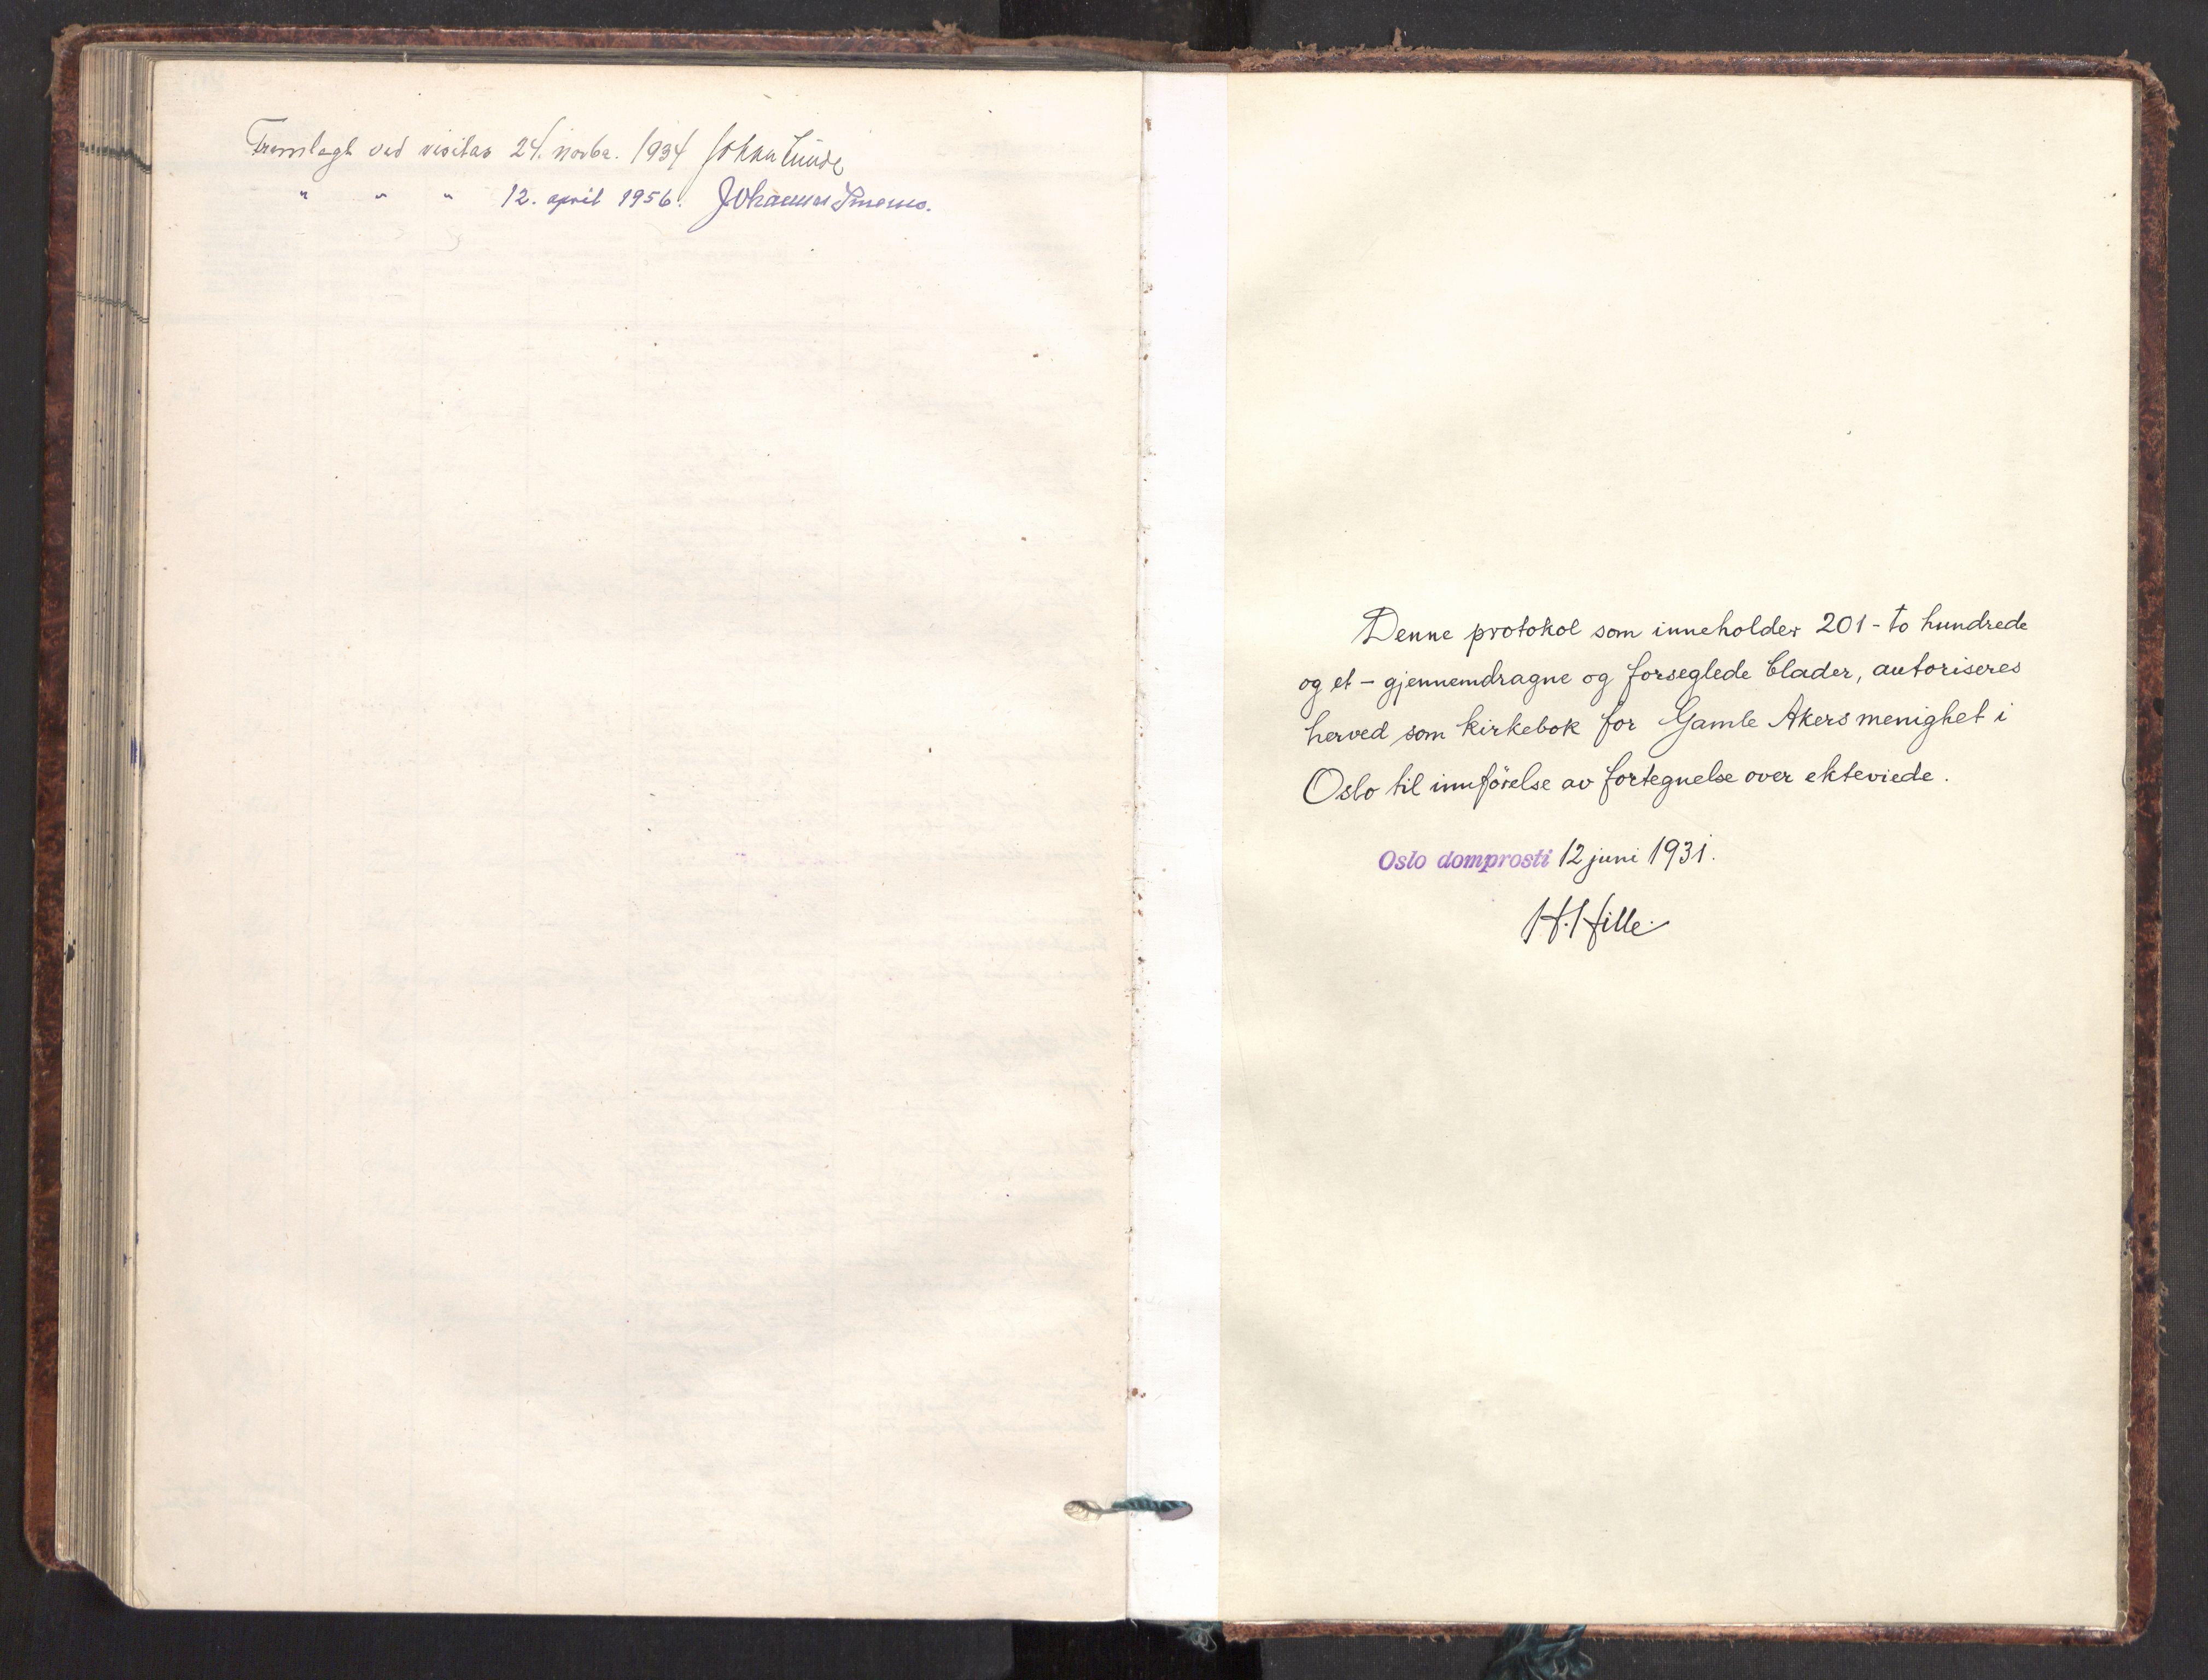 SAO, Gamle Aker prestekontor Kirkebøker, F/L0021: Parish register (official) no. 21, 1932-1941